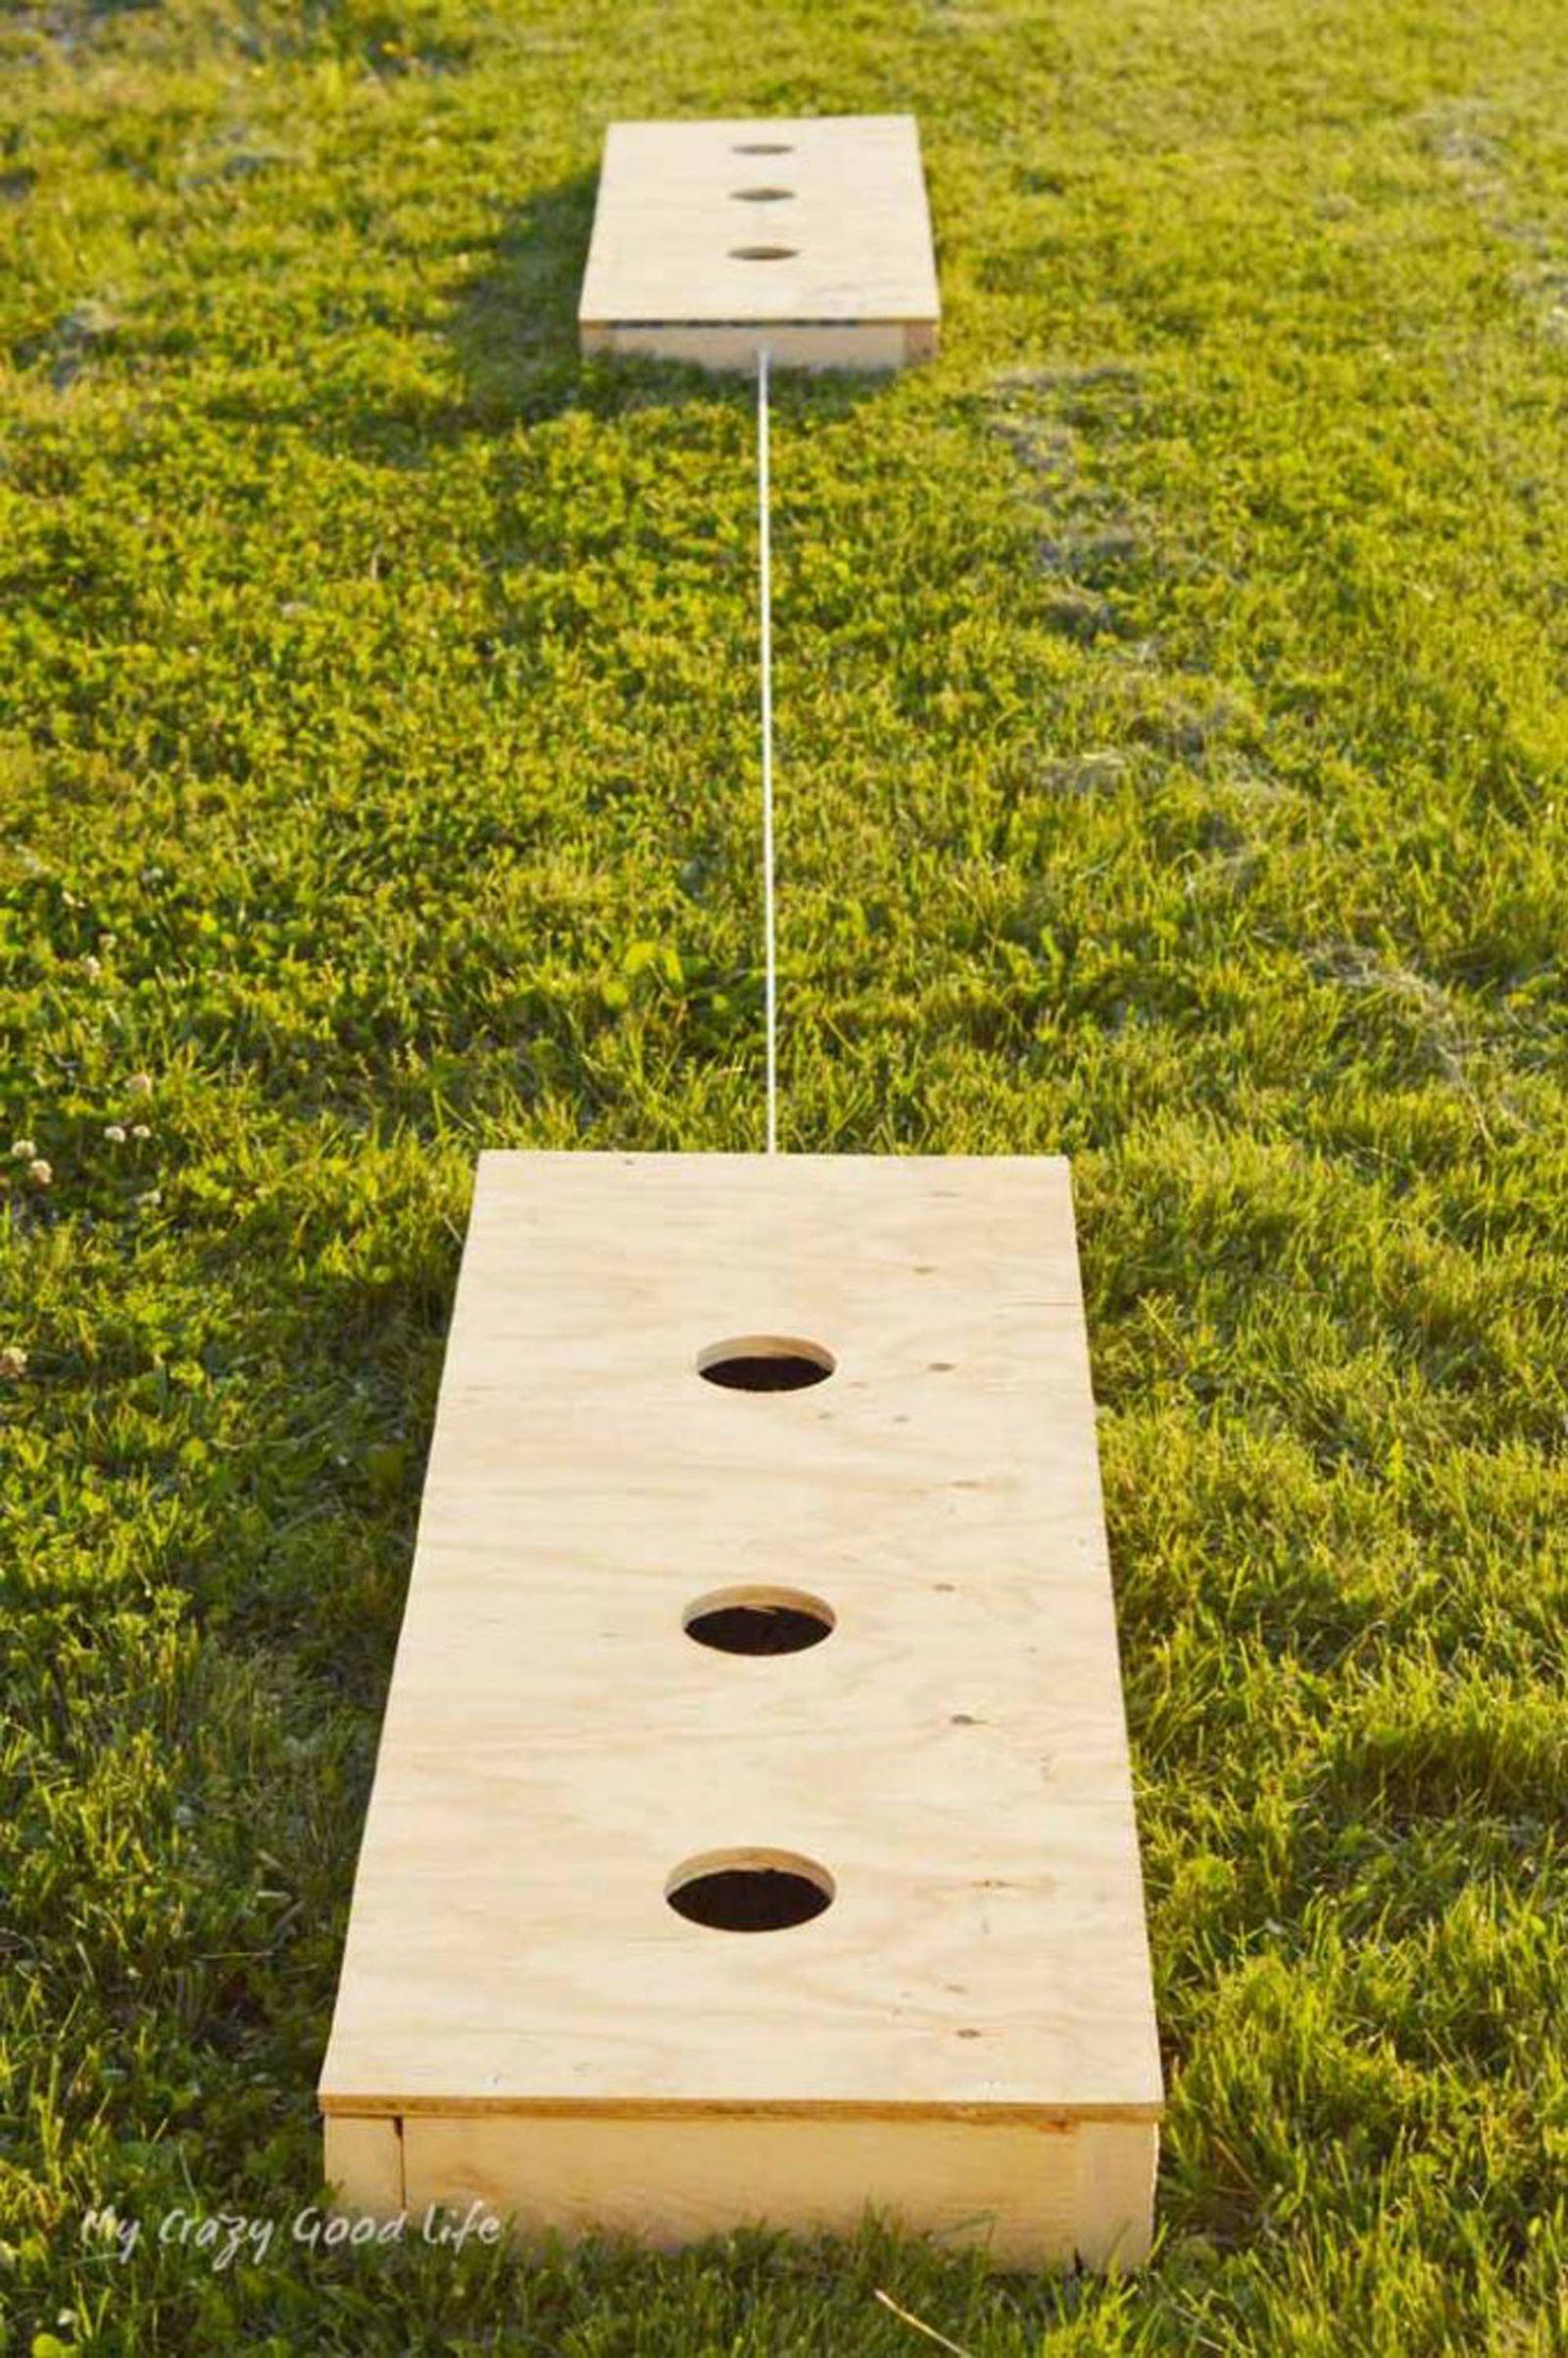 41+ Make 3 hole washer game information